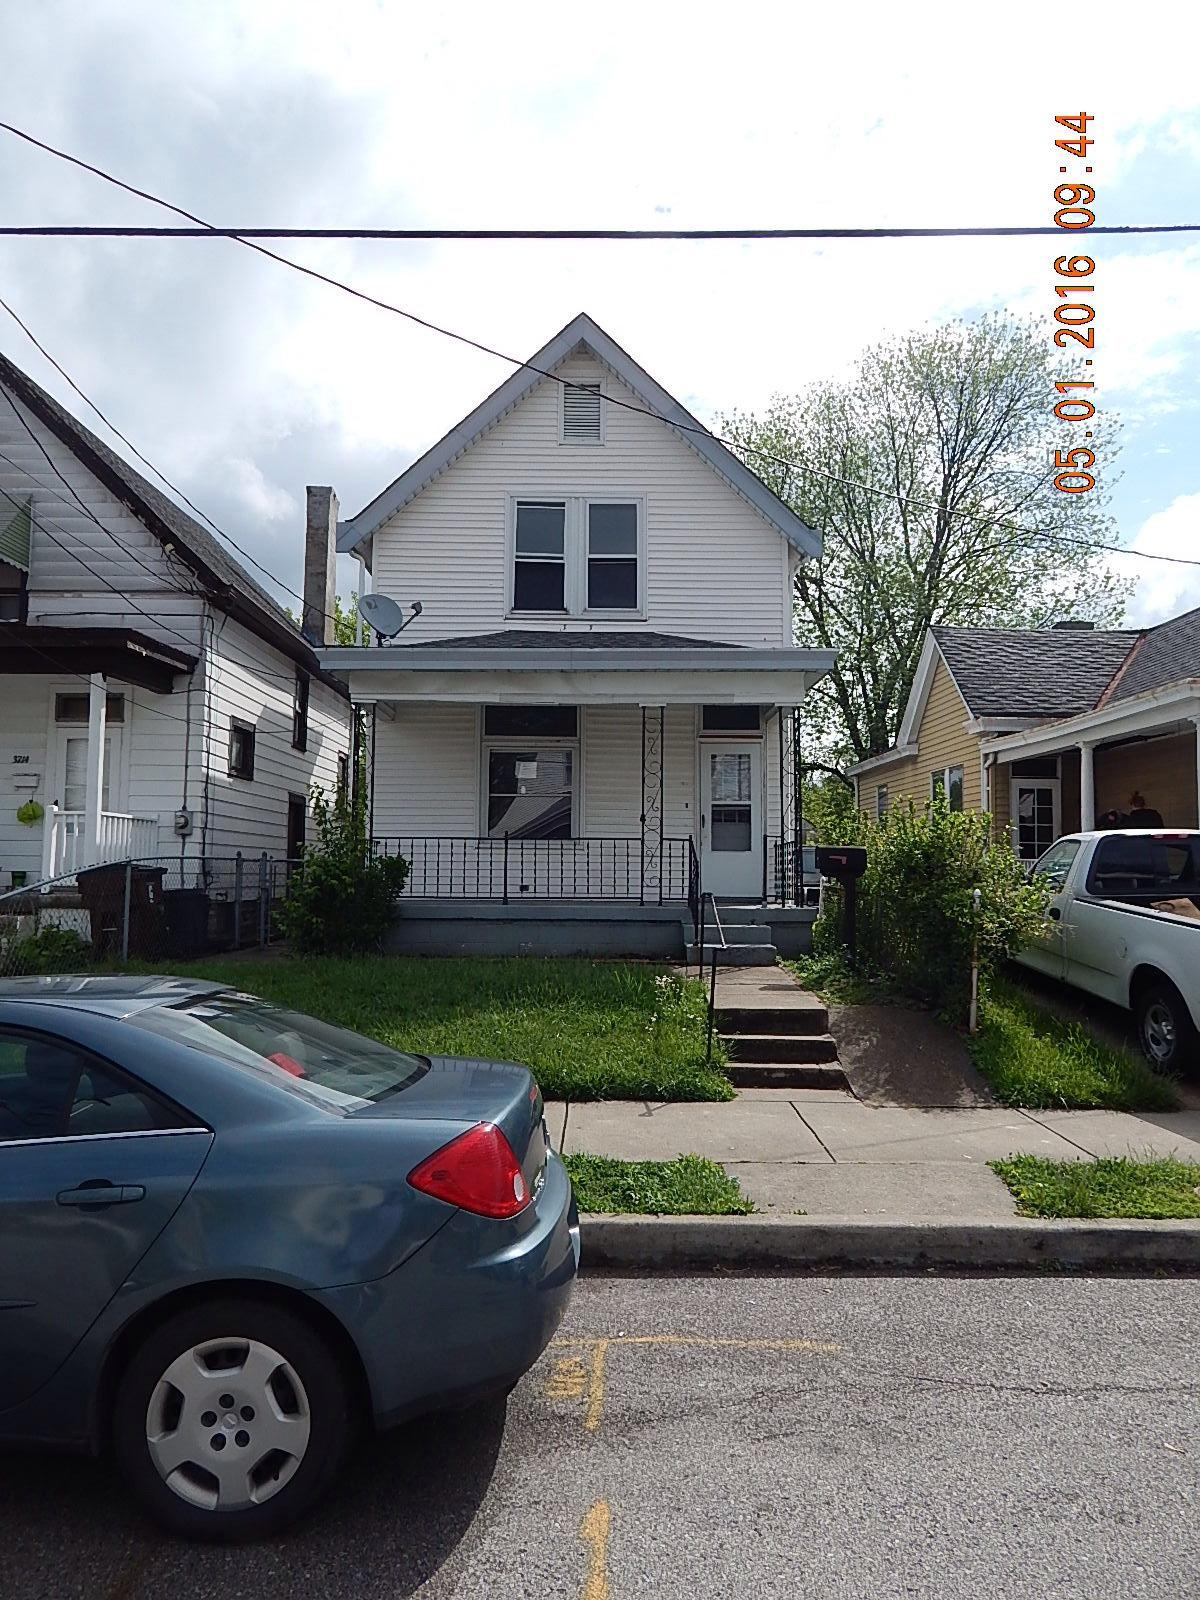 3716 Huntington Ave, Covington, KY 41015